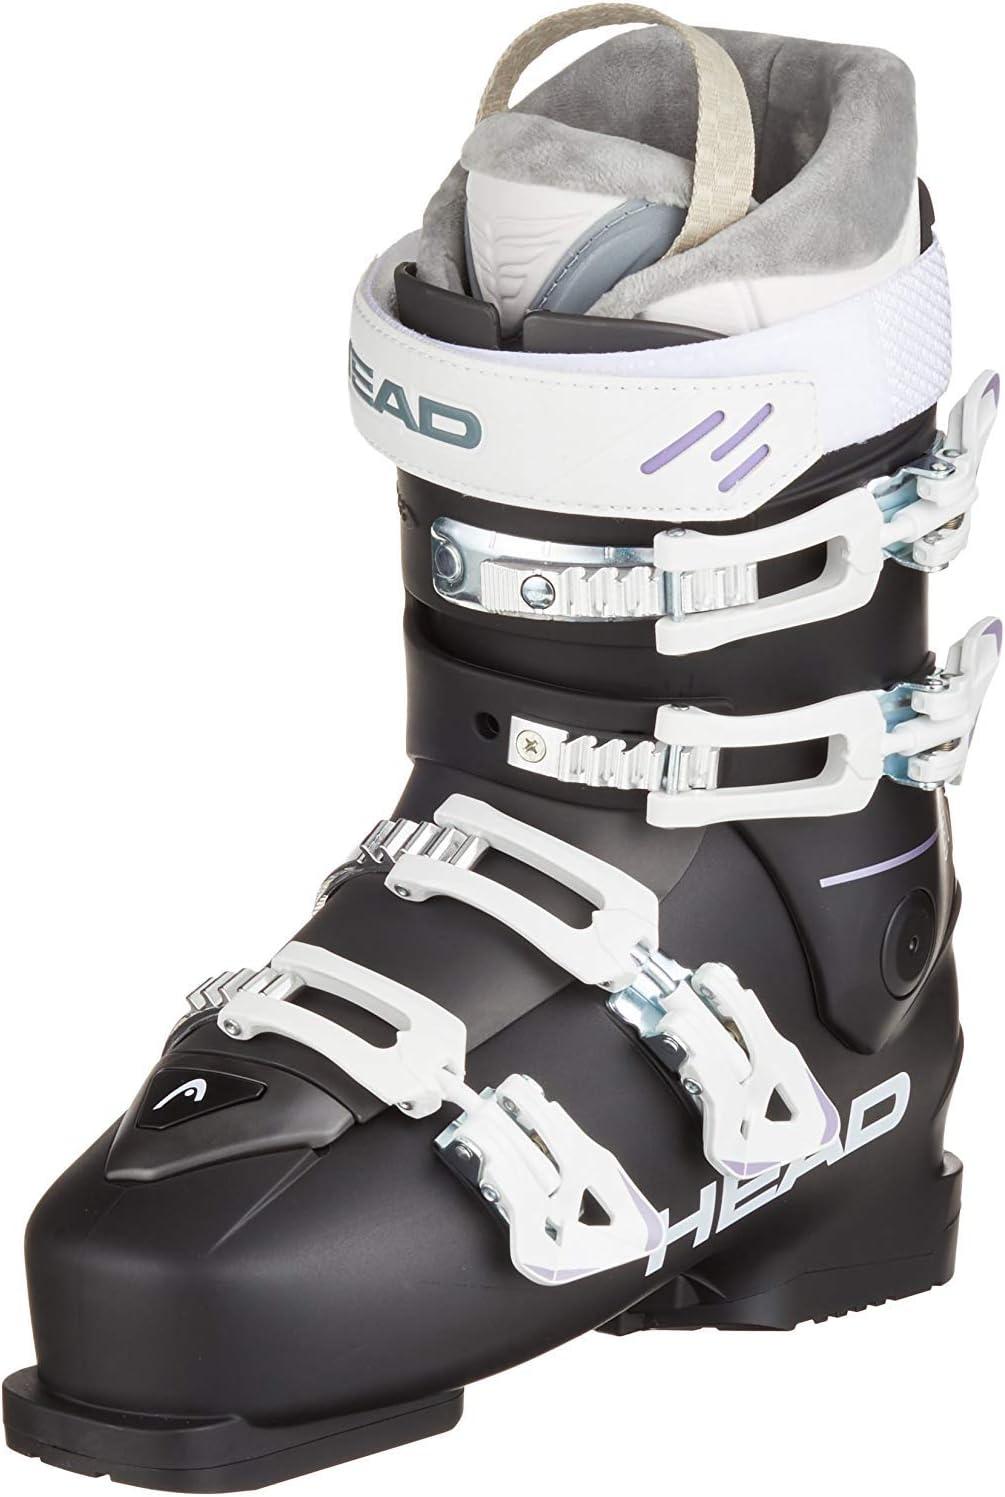 HEAD Women's Fx Gt Ski 35% OFF Boots Sale price W